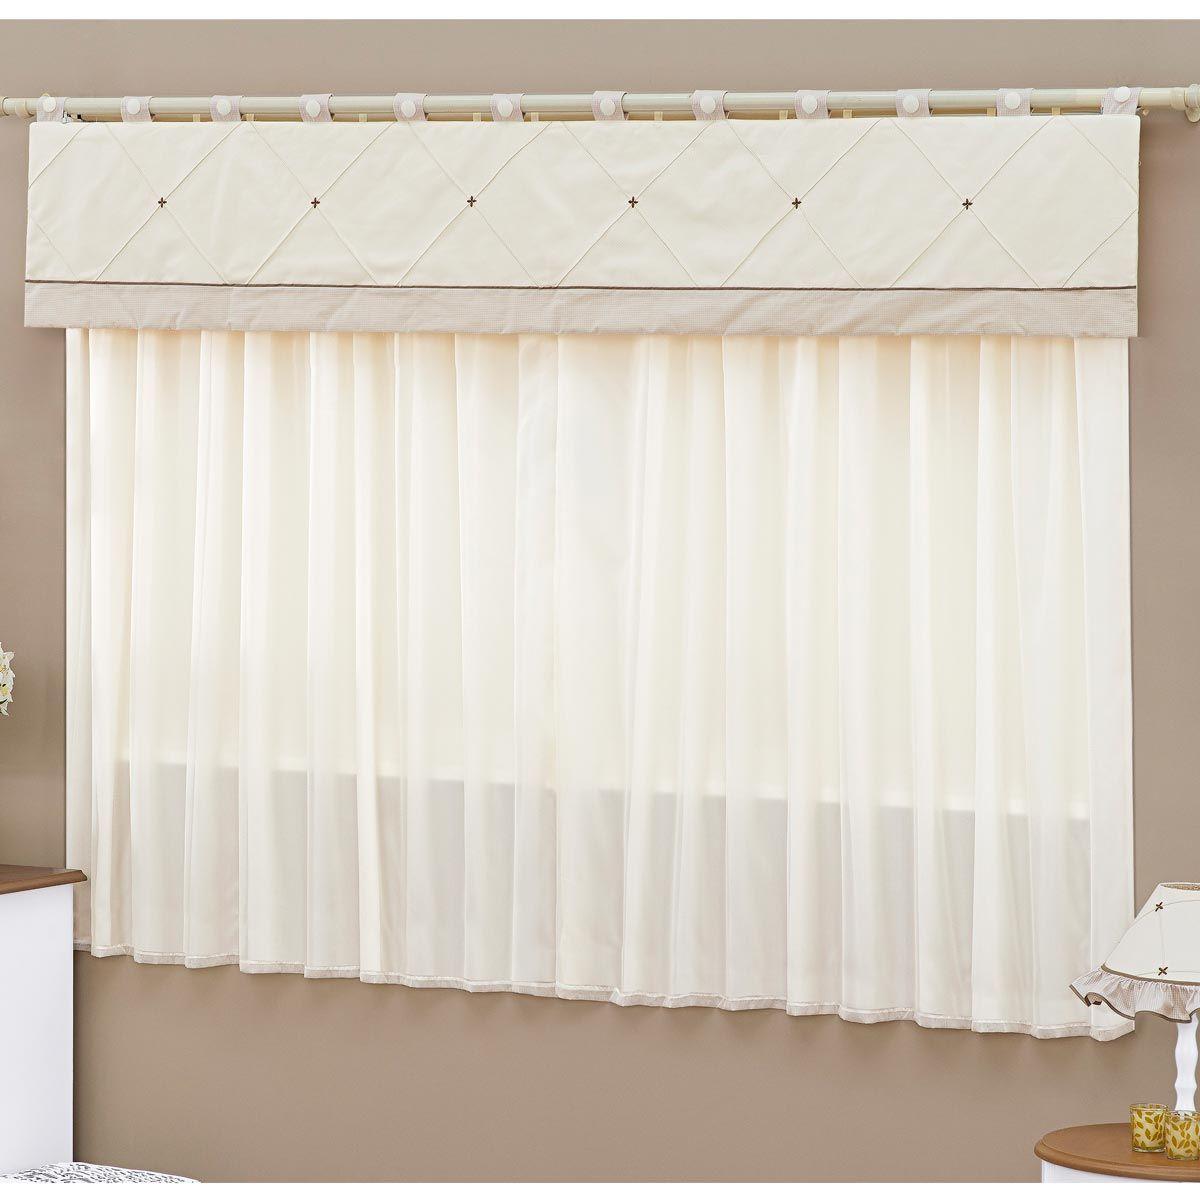 cortina de quarto de bebe - Pesquisa Google | cortinas | Pinterest